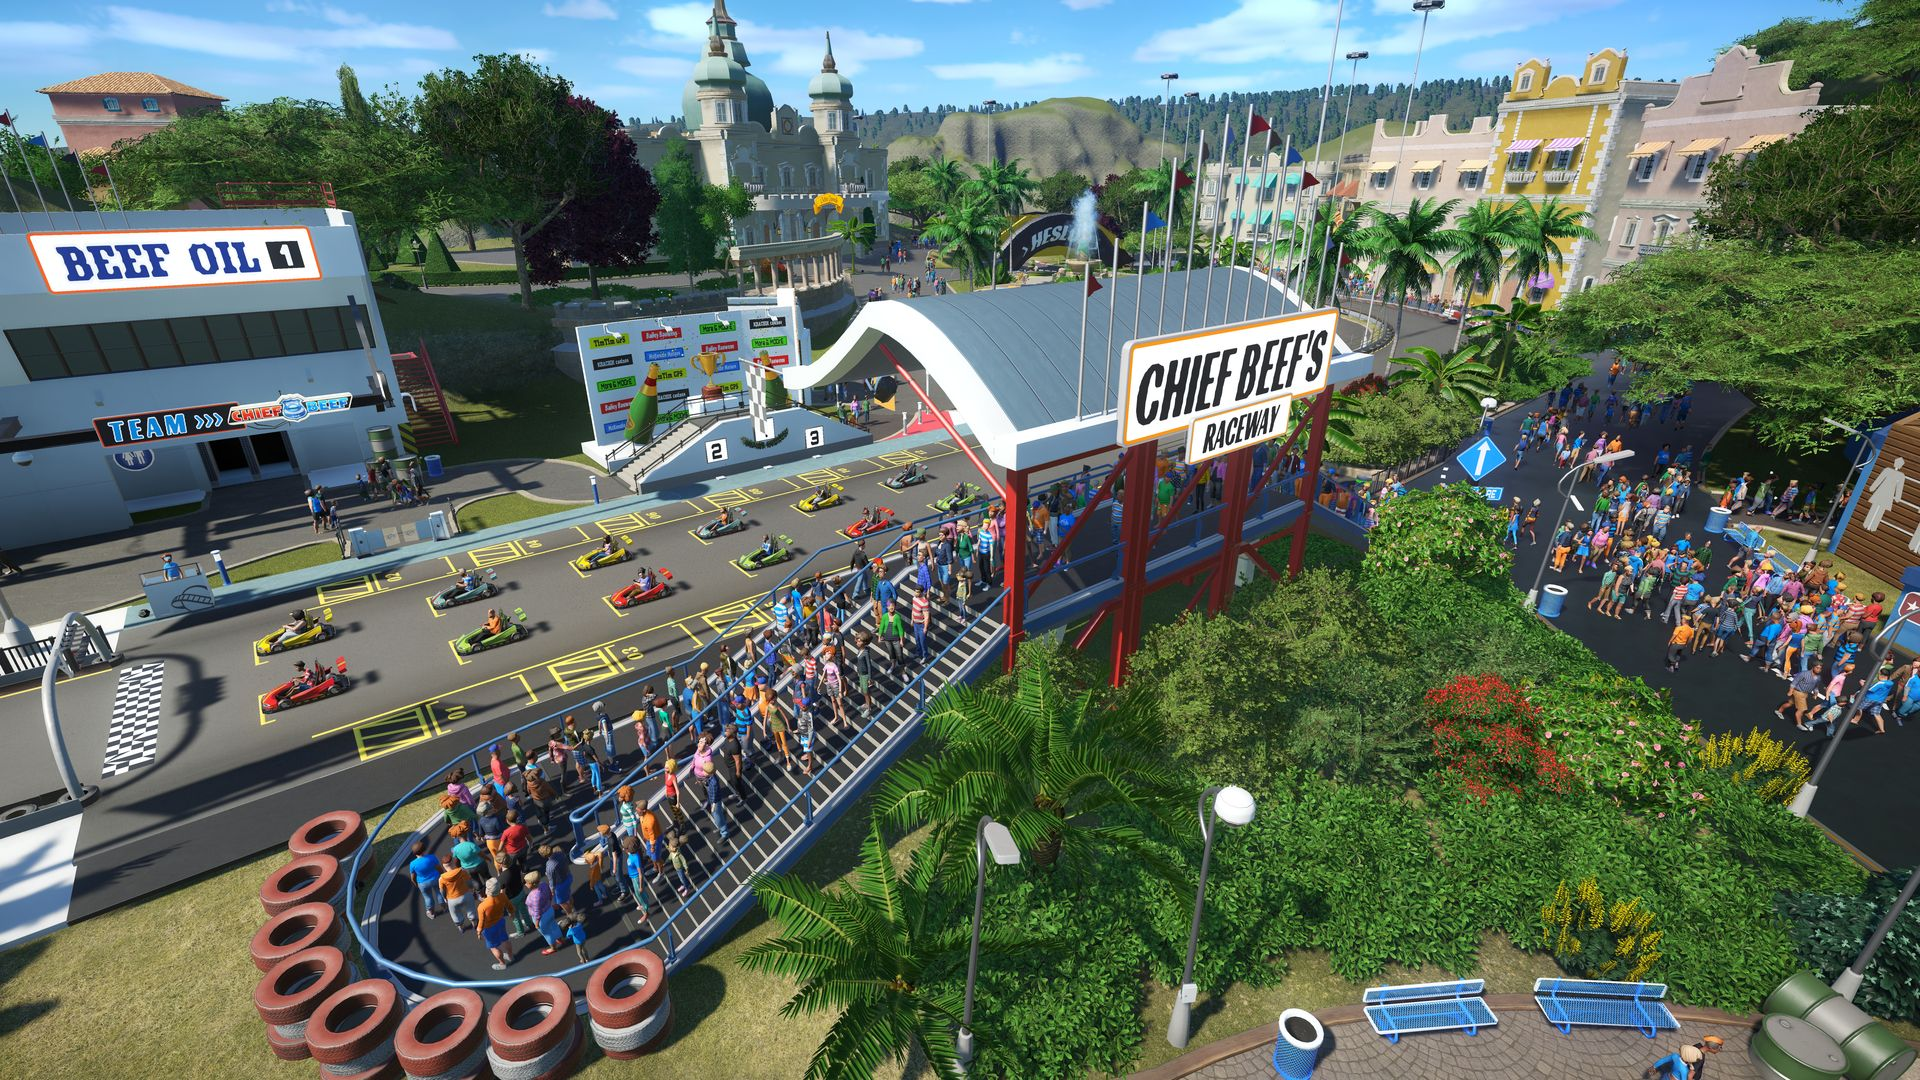 Nové horské dráhy, motokáry a kriminálníci v Planet Coaster 141830